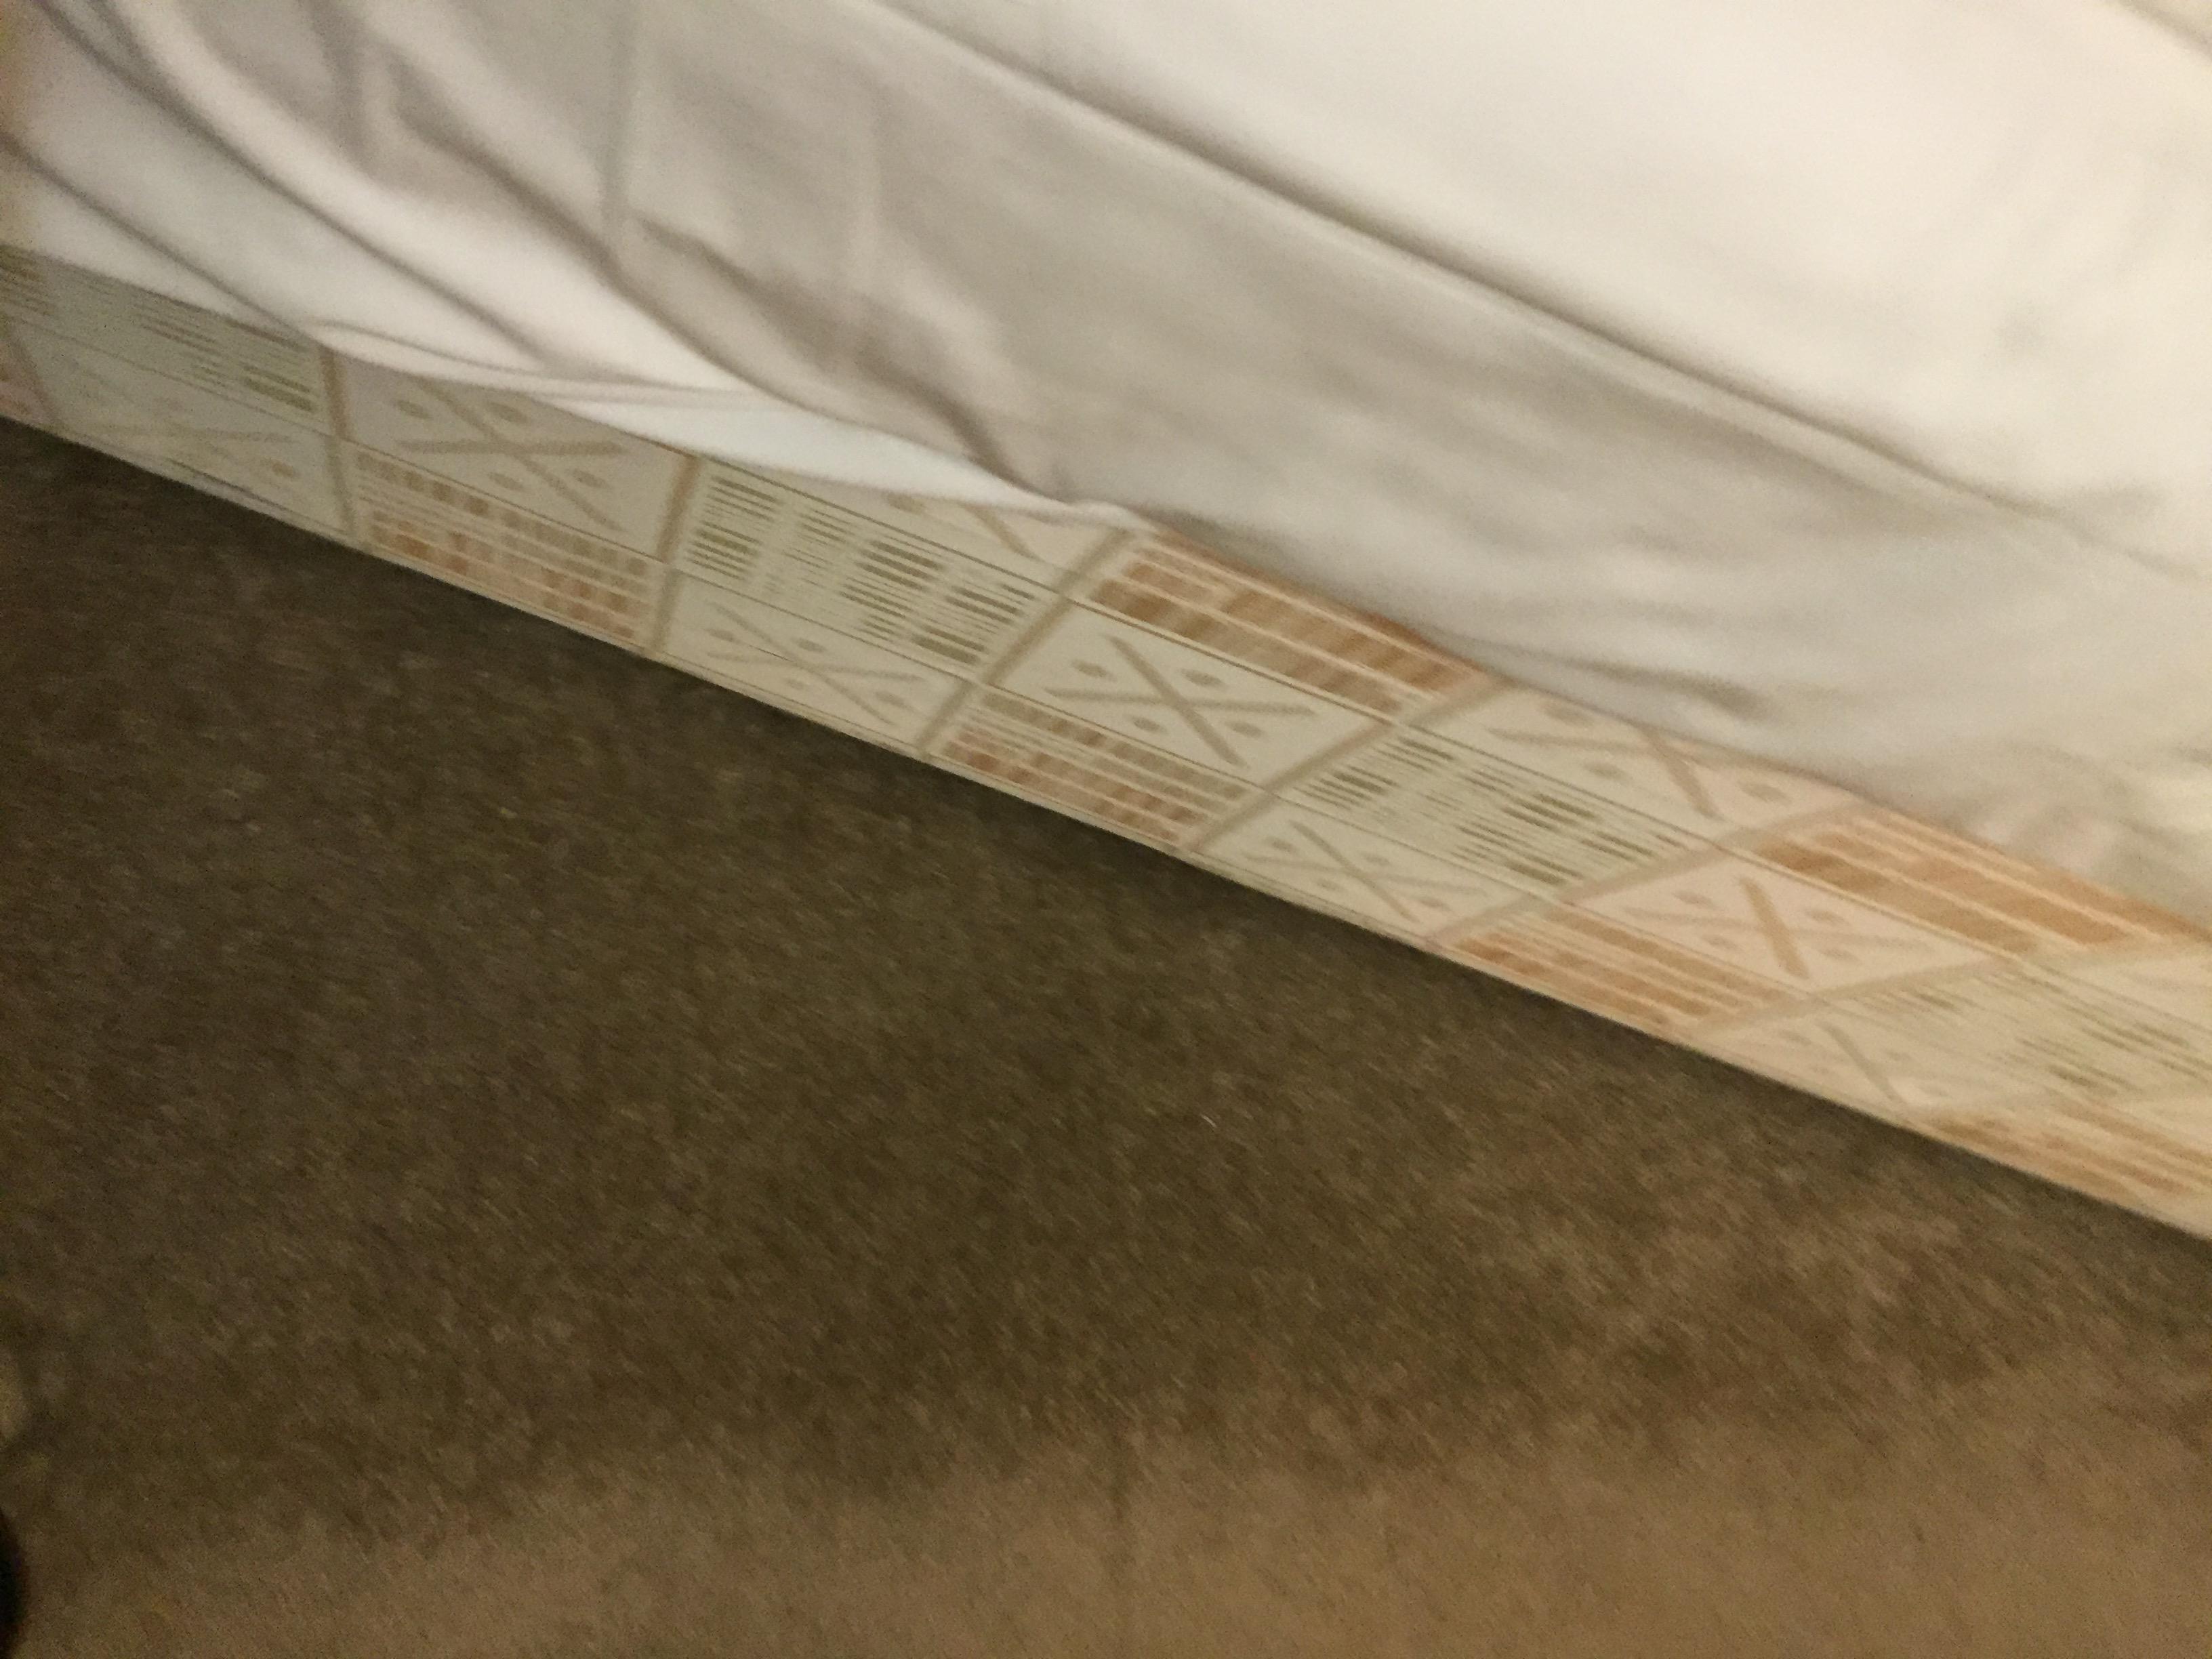 Look st the carpet